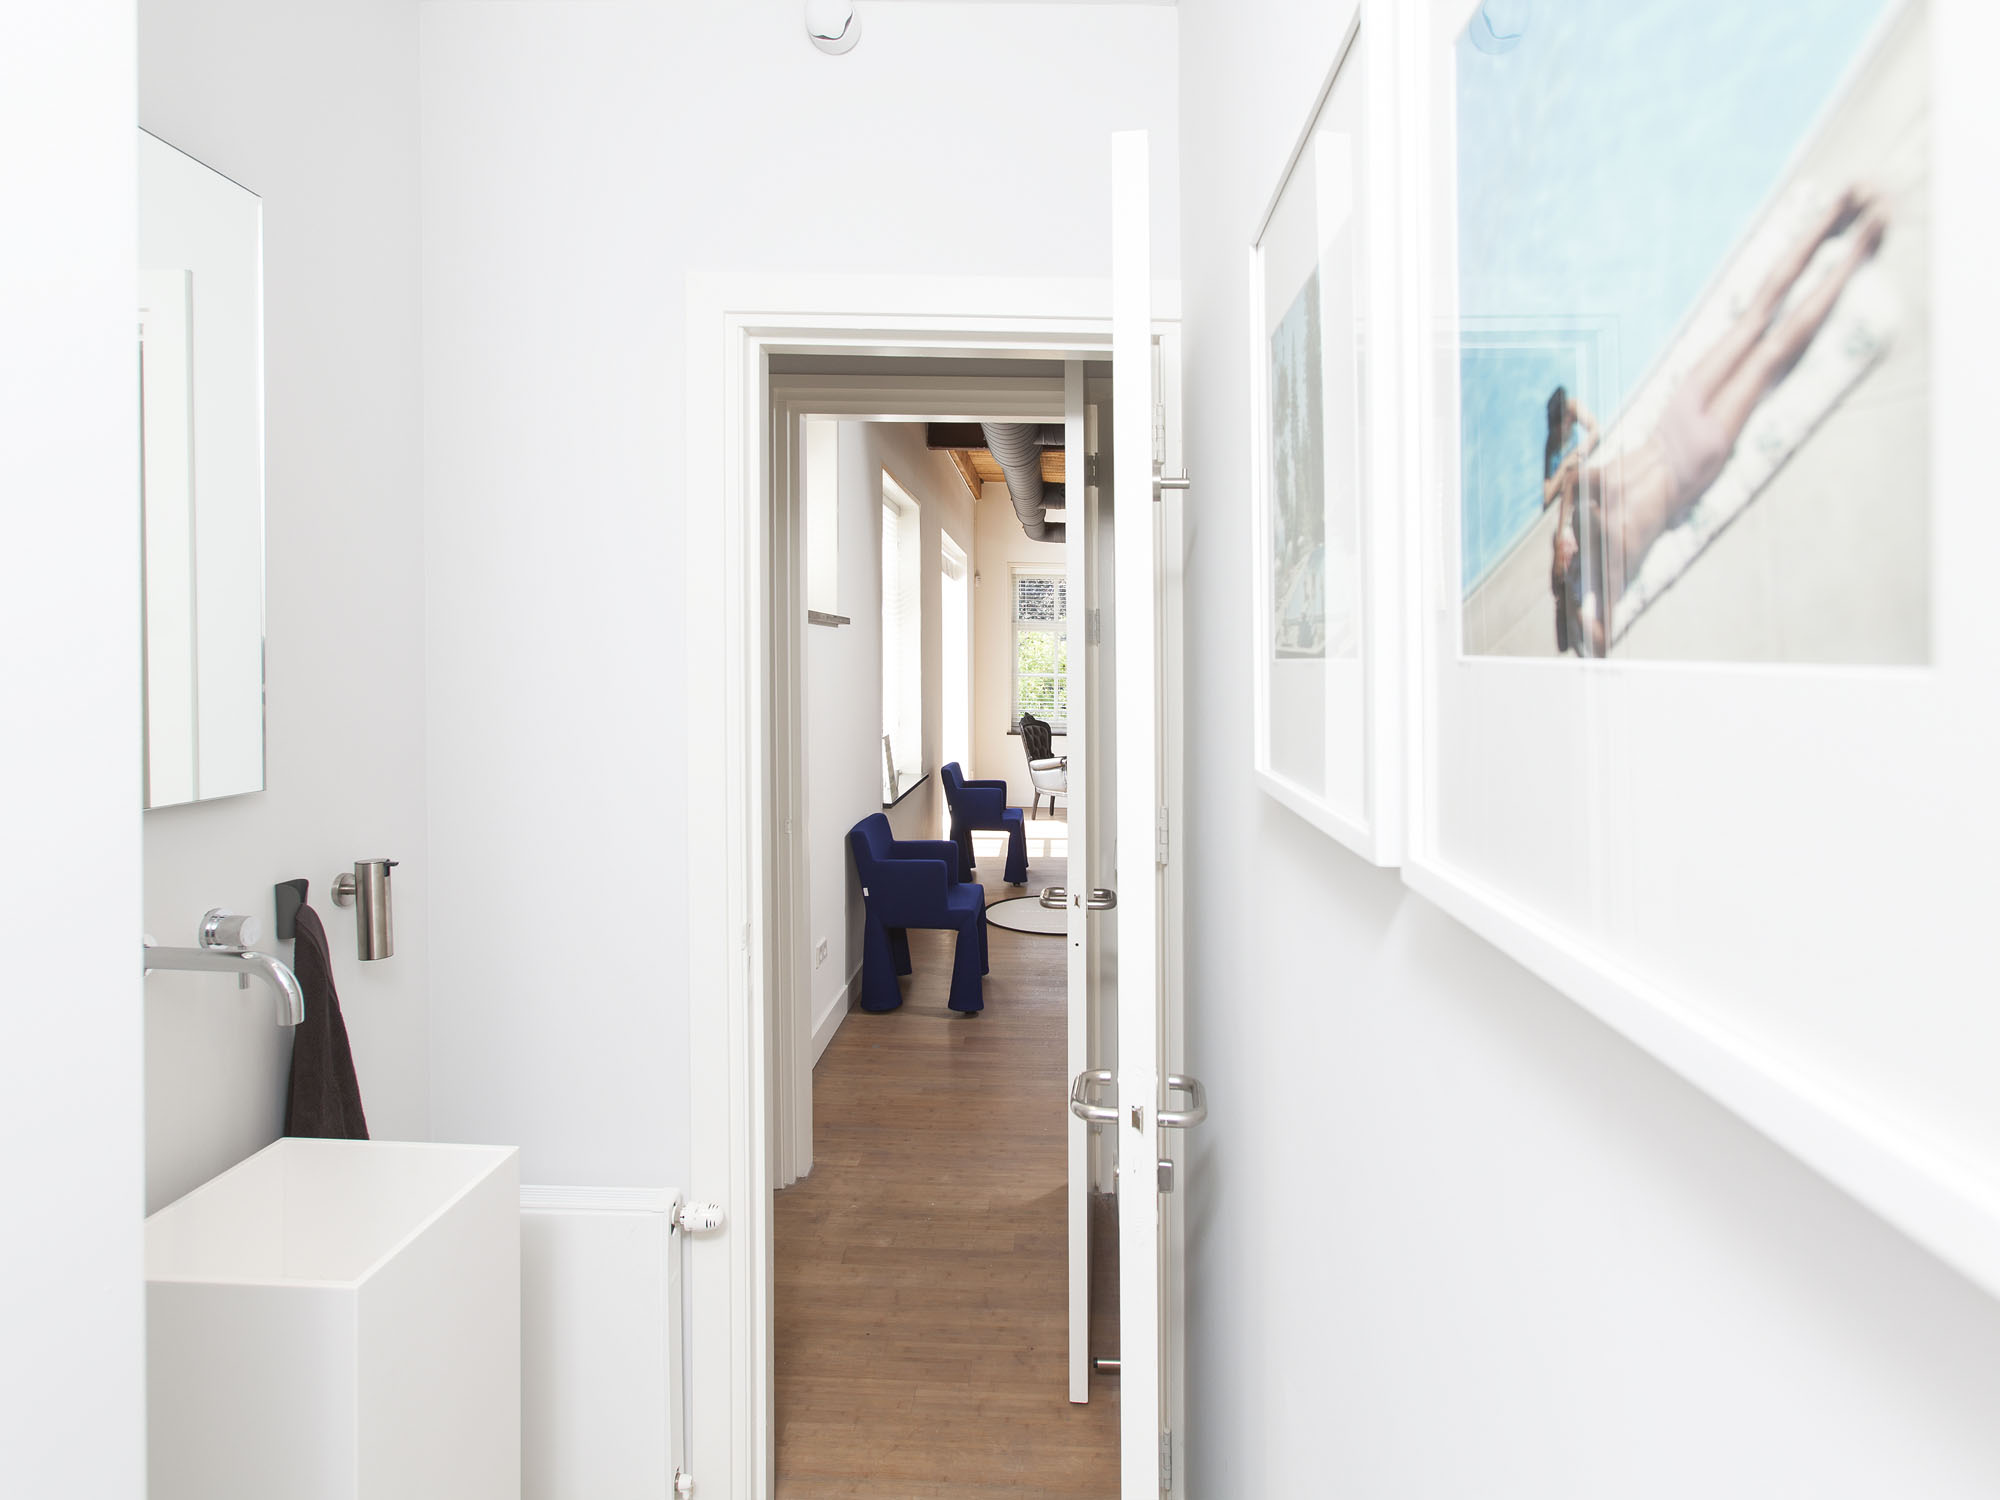 studio-hermanides-loft-office-9.jpg